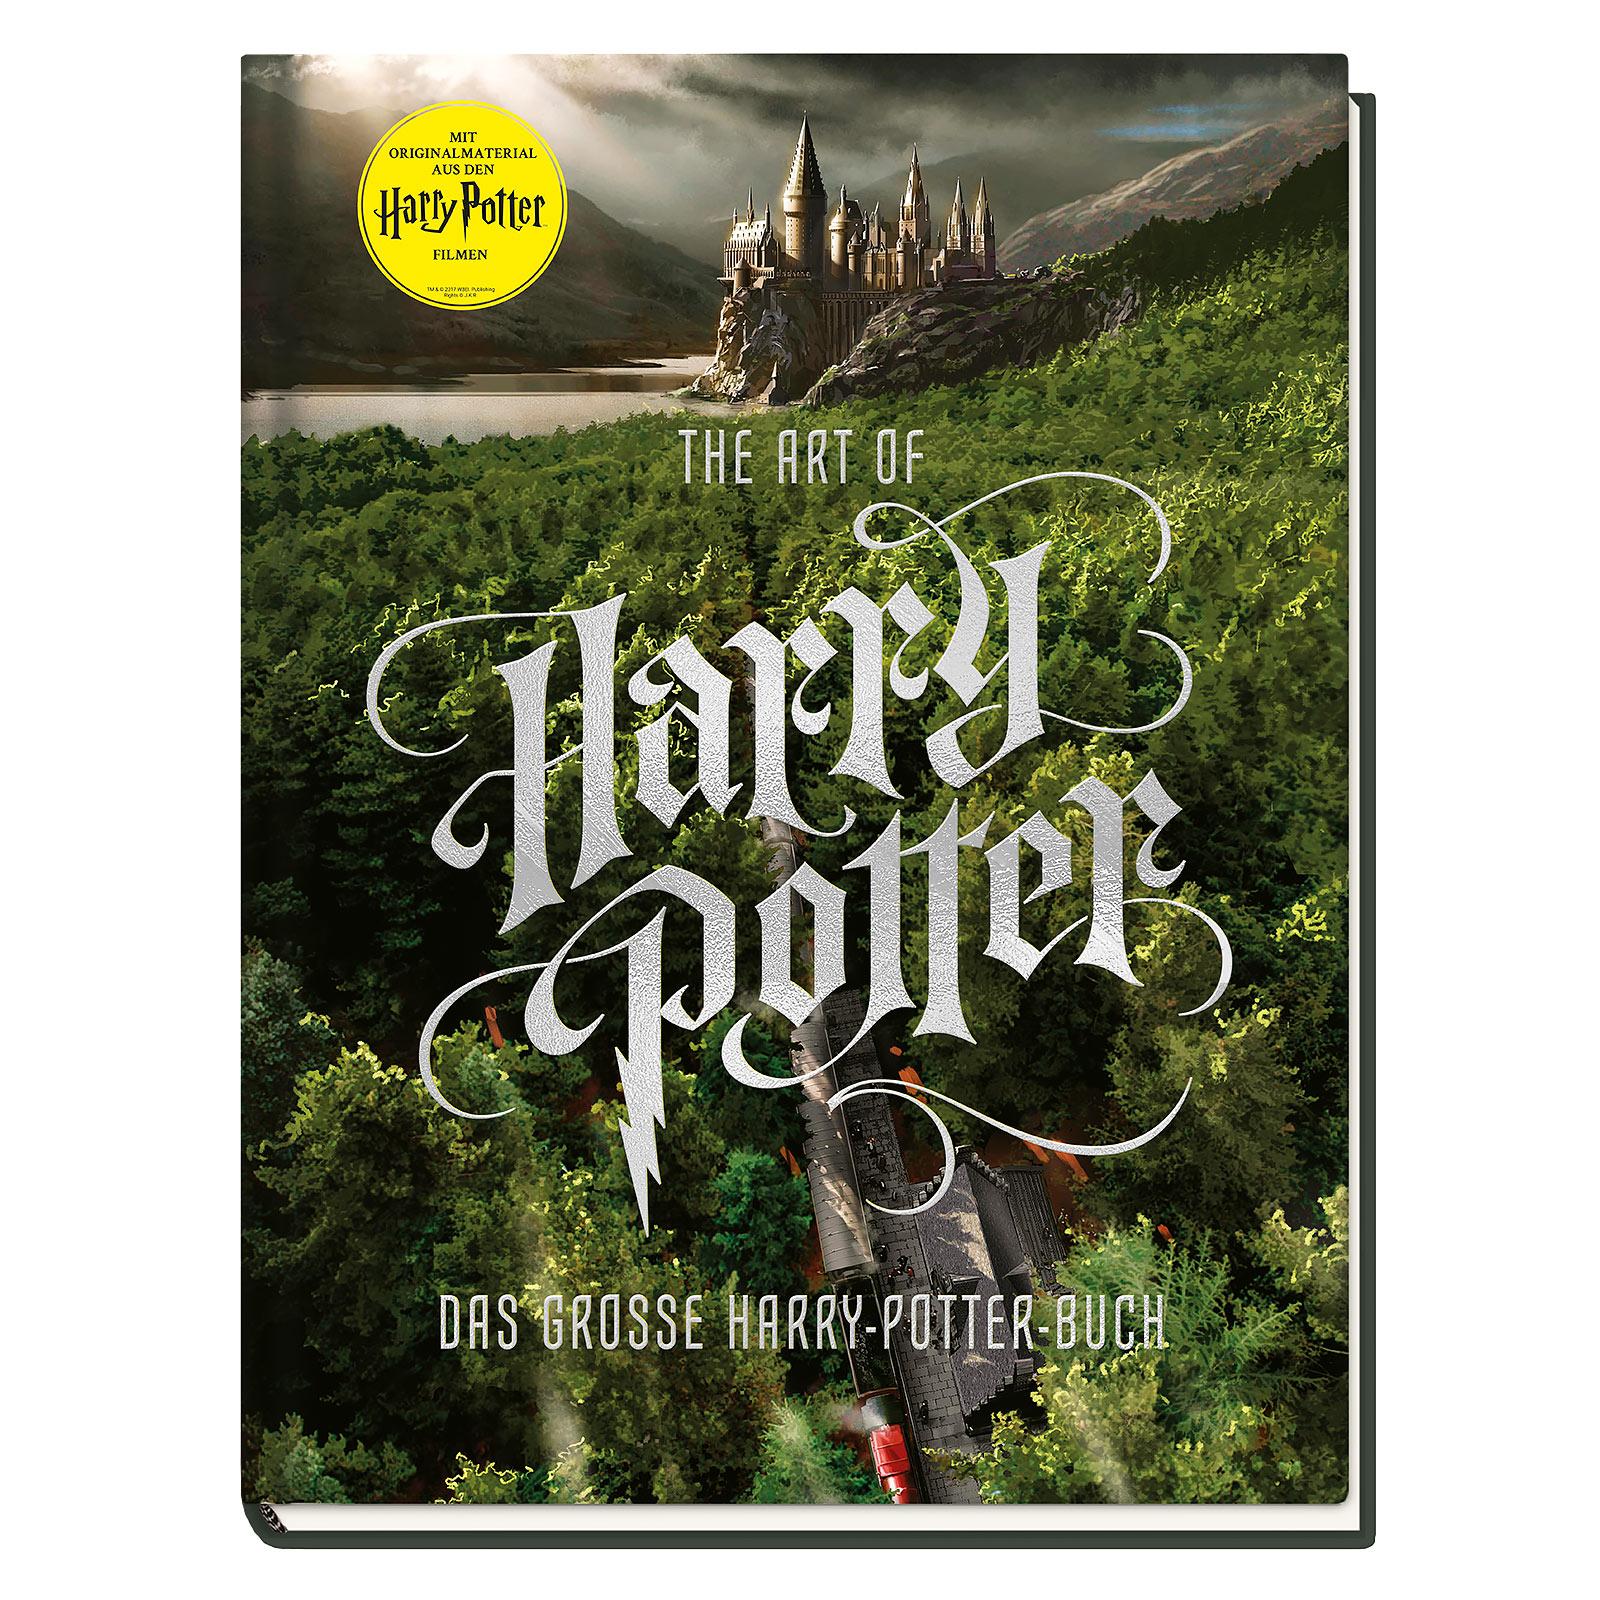 The Art of Harry Potter - Das große Harry-Potter-Buch